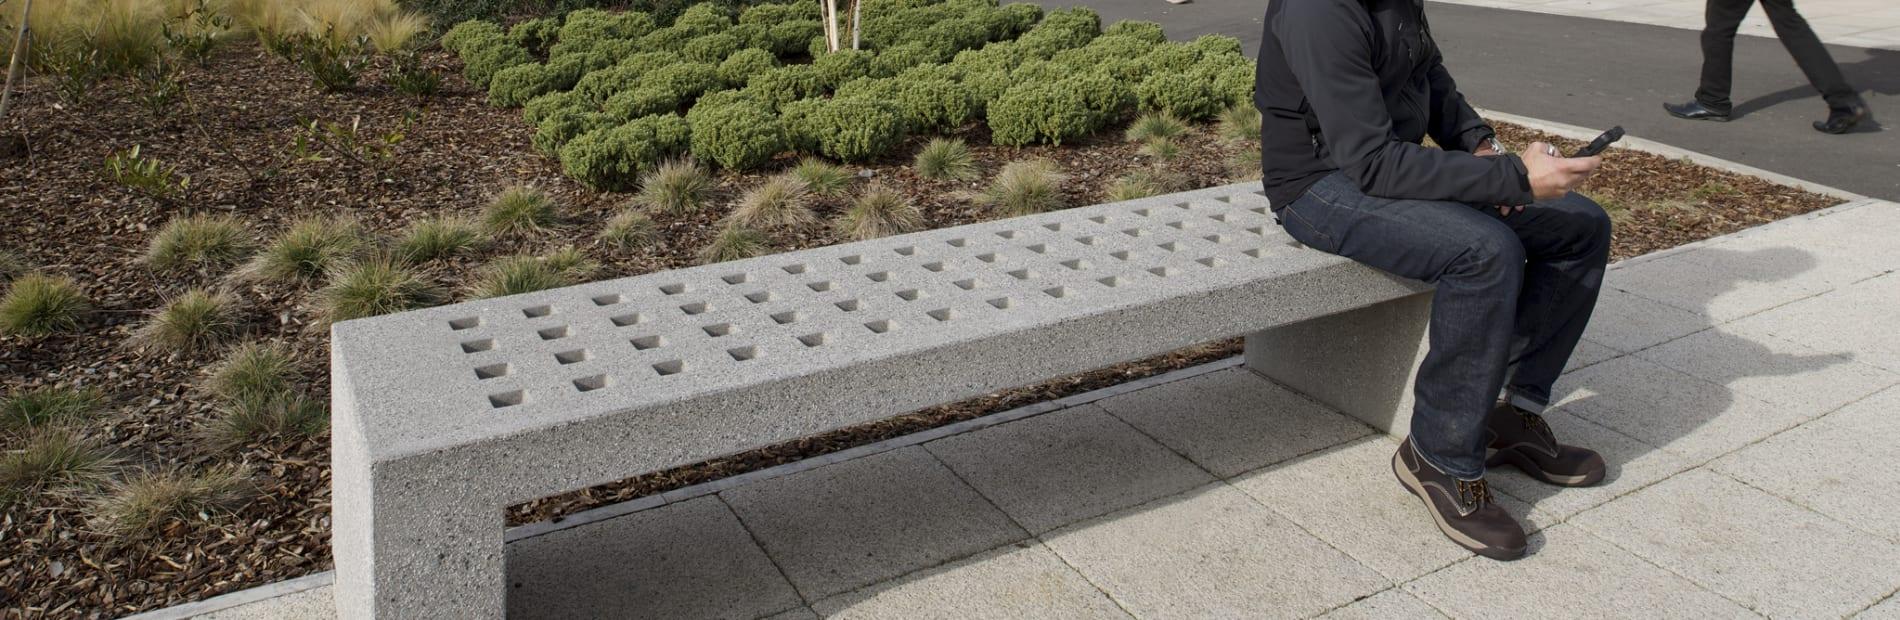 escofet mayo bench